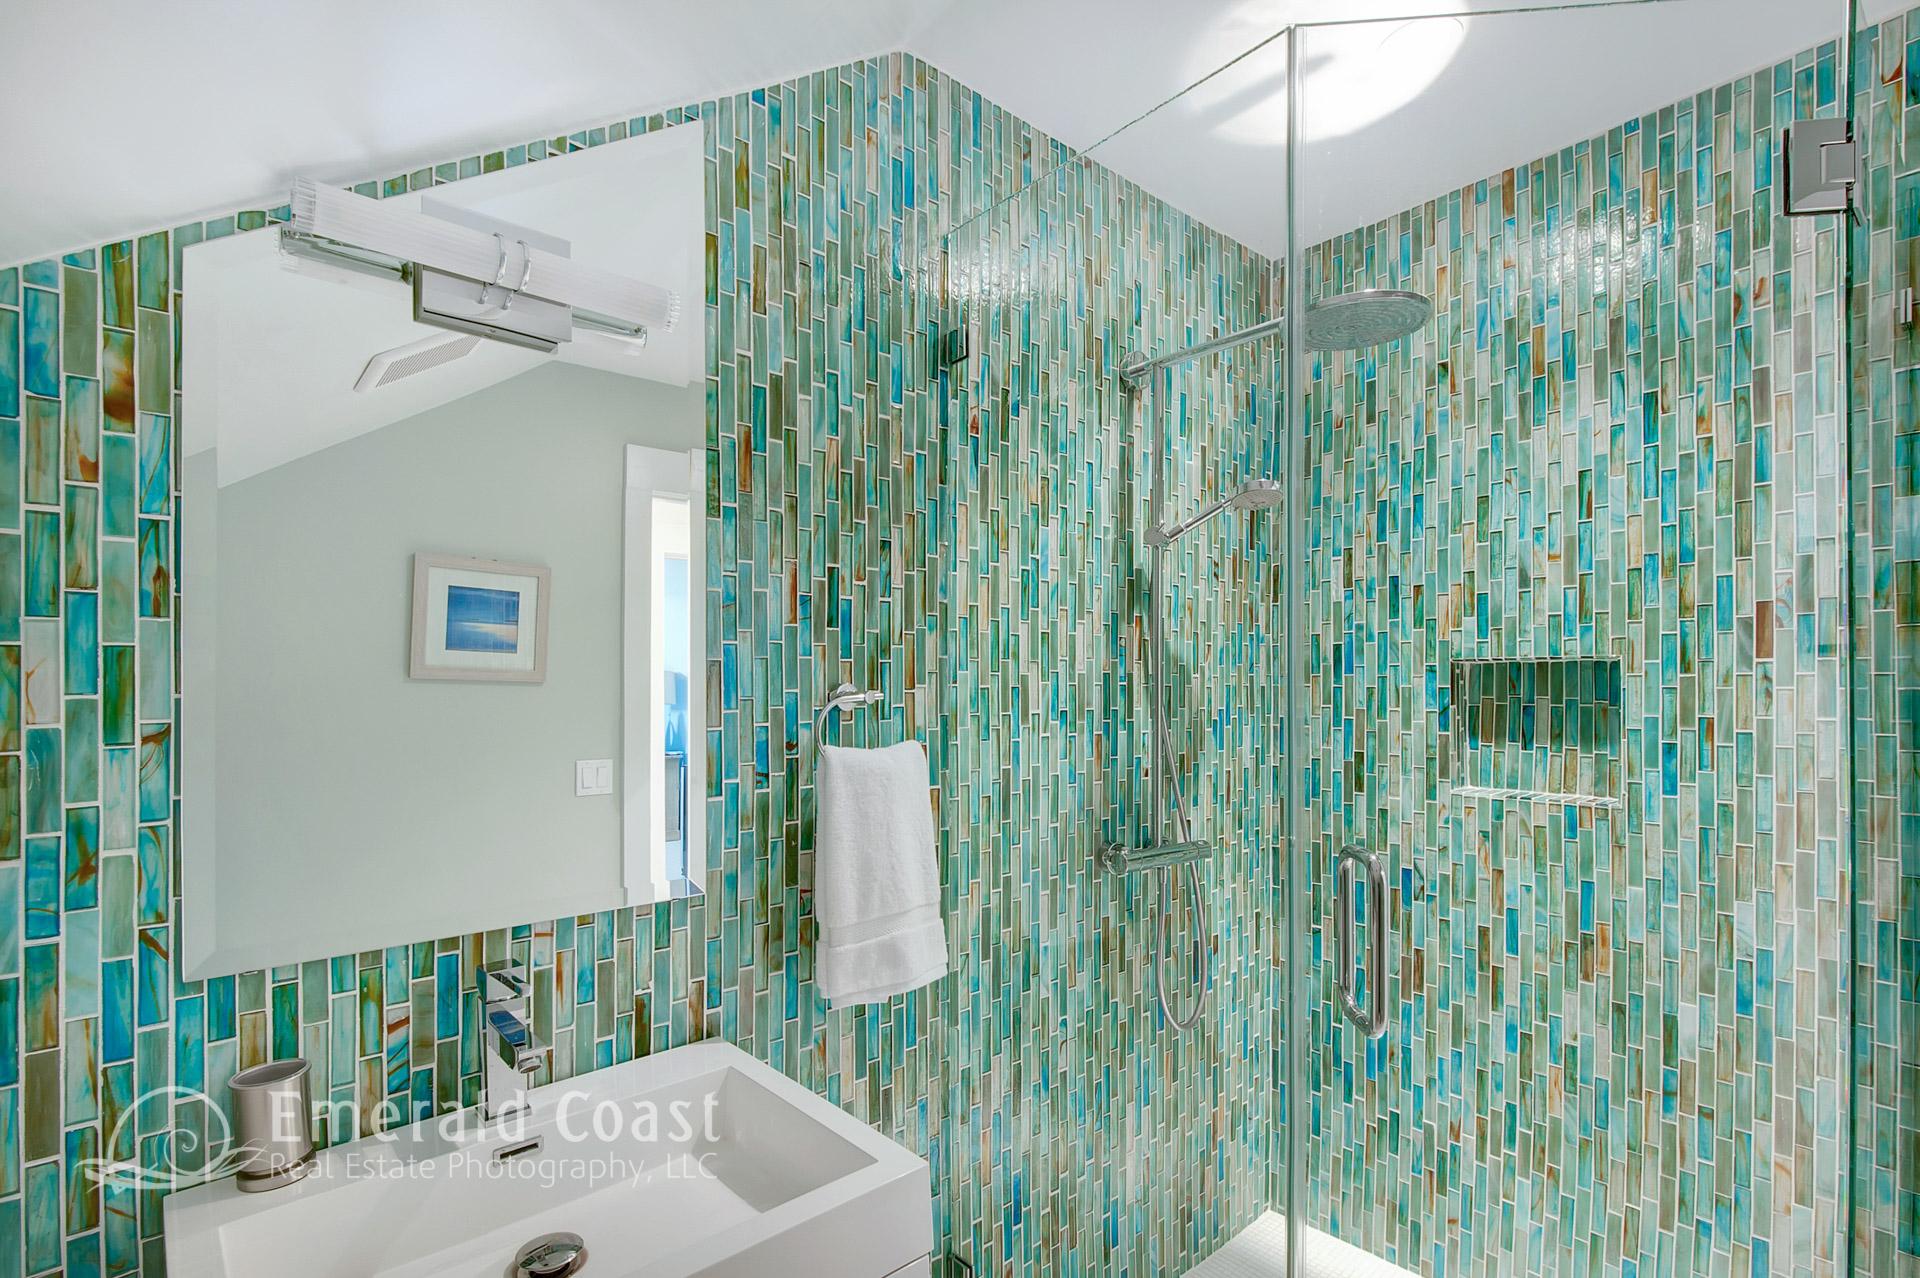 green glass tiled bathroom